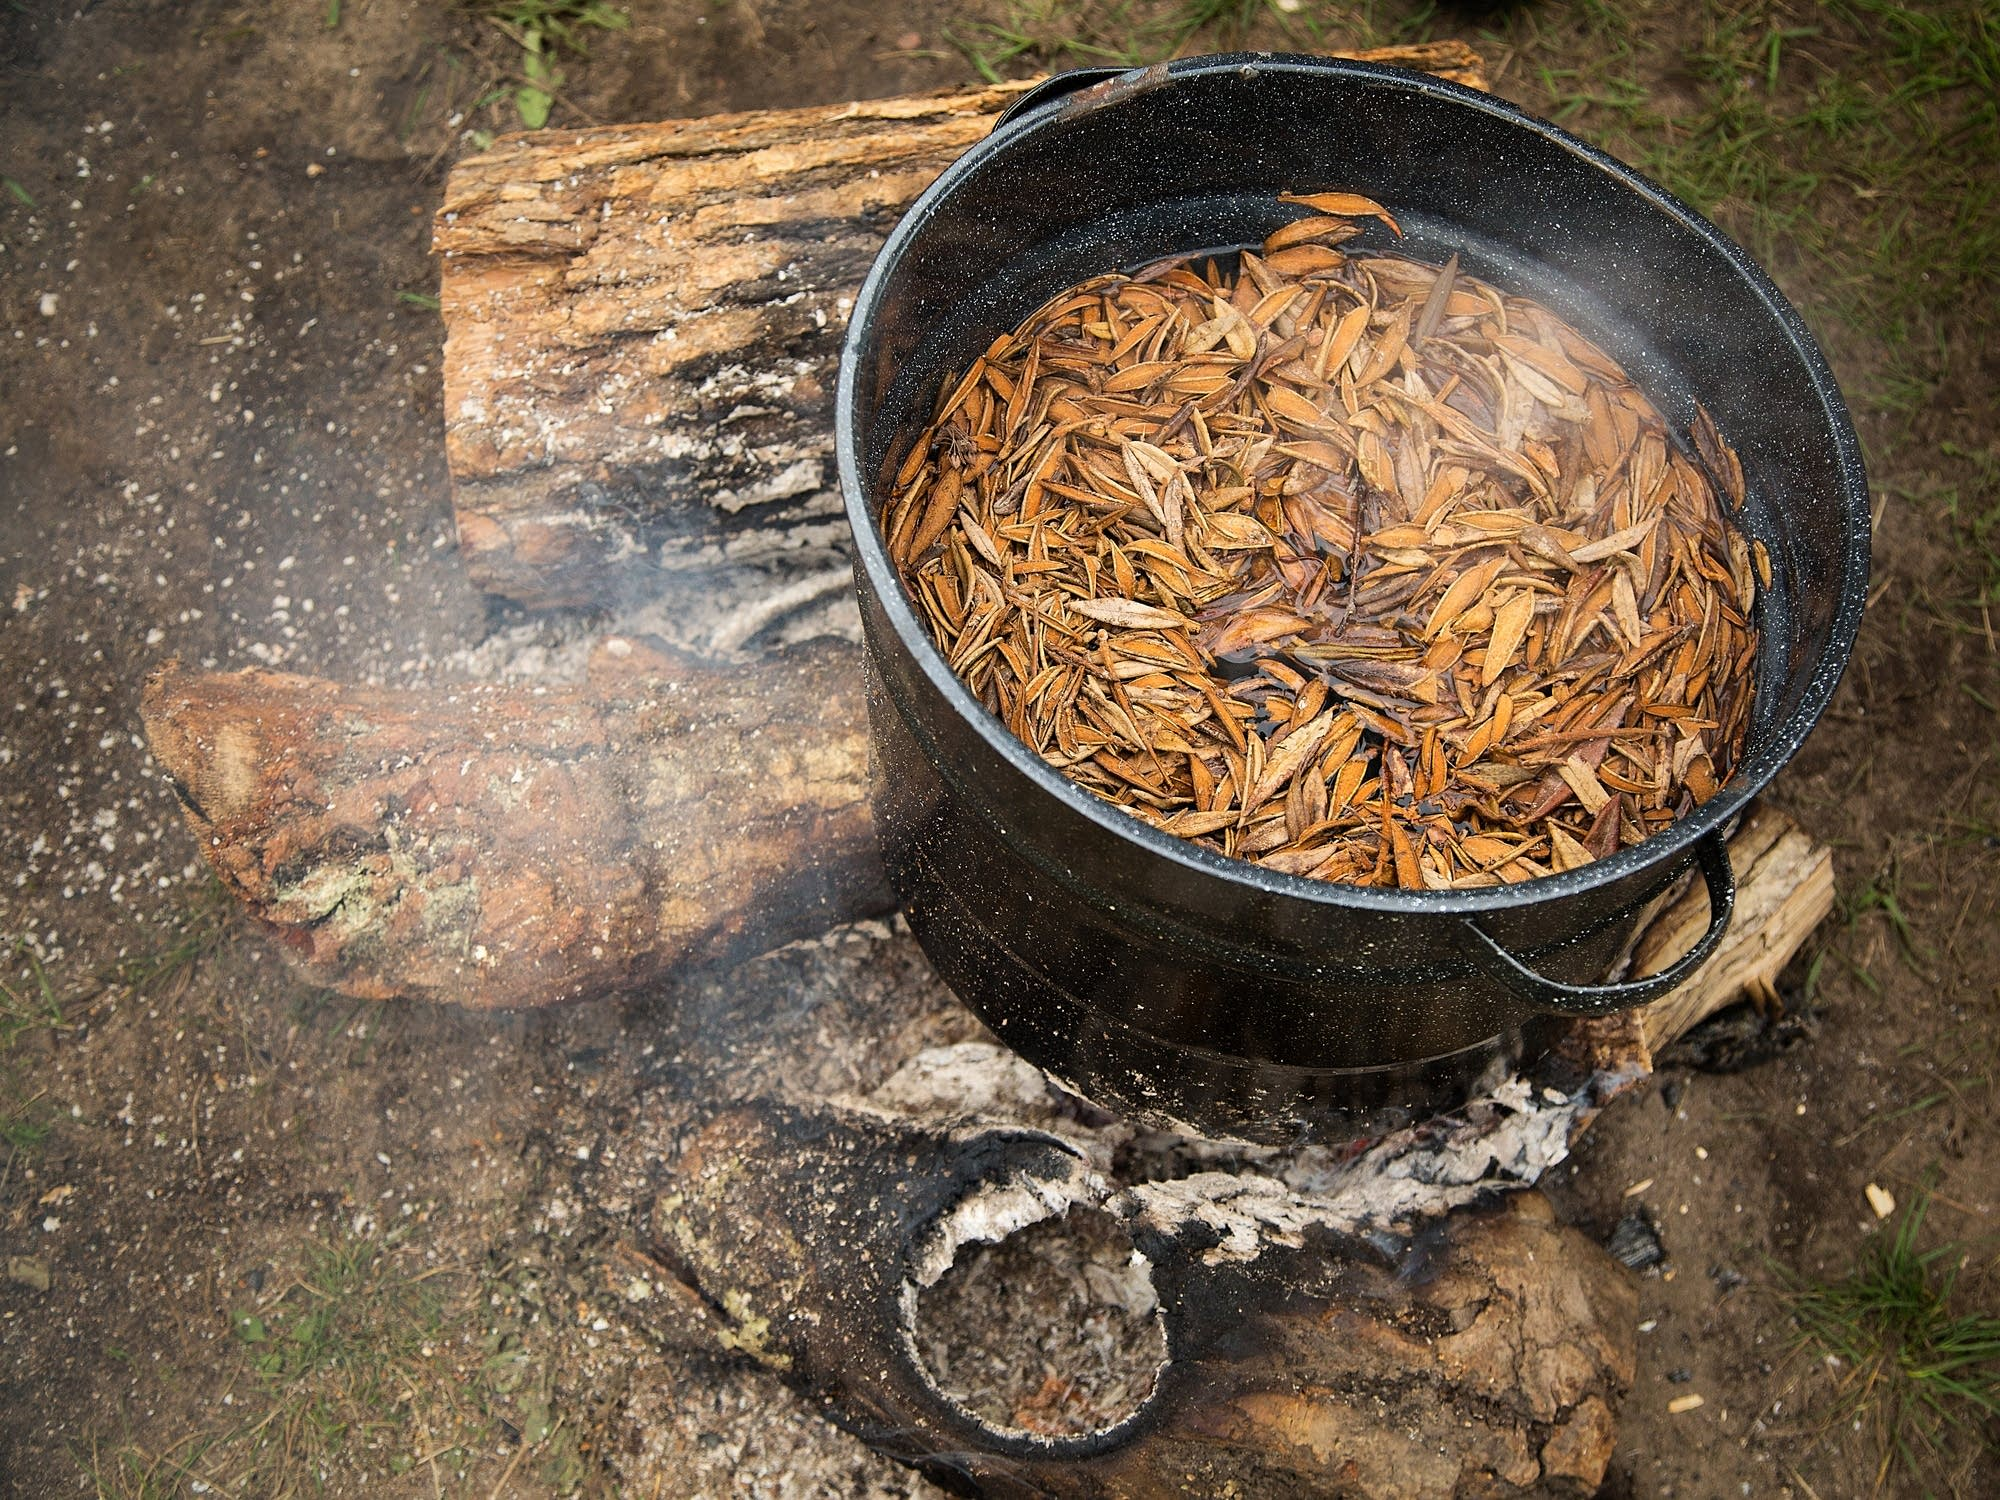 Swamp tea, also known as Labrador tea, stews.